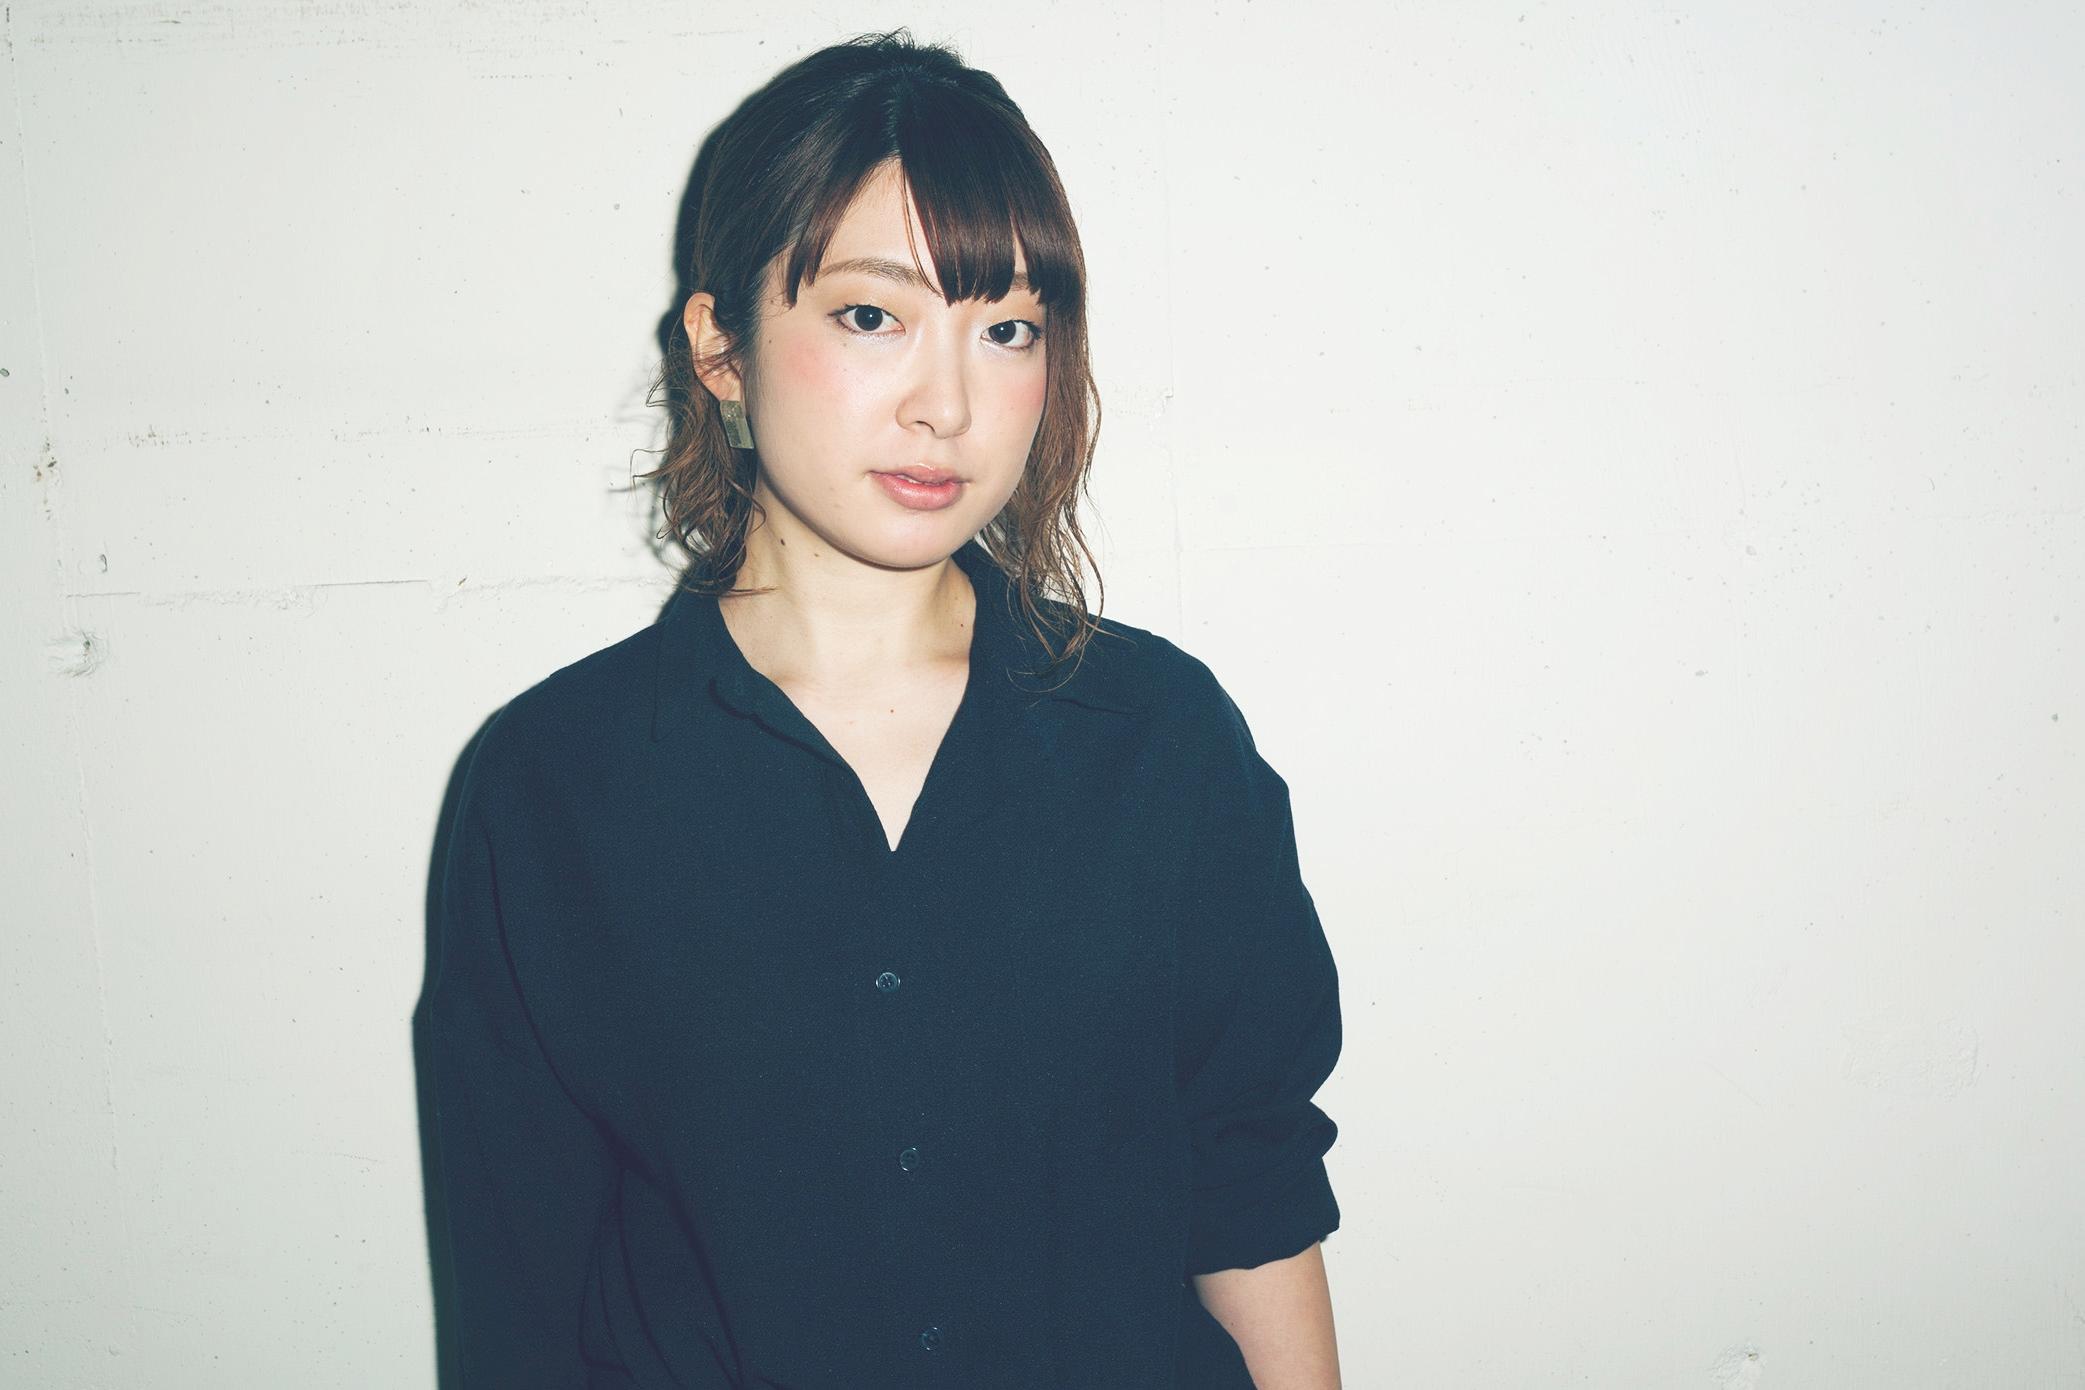 Chiharu Waki   Stylist  東京都出身。国際文化理容美容専門学校卒業。都内2店舗を経て2012年Savaに参加。